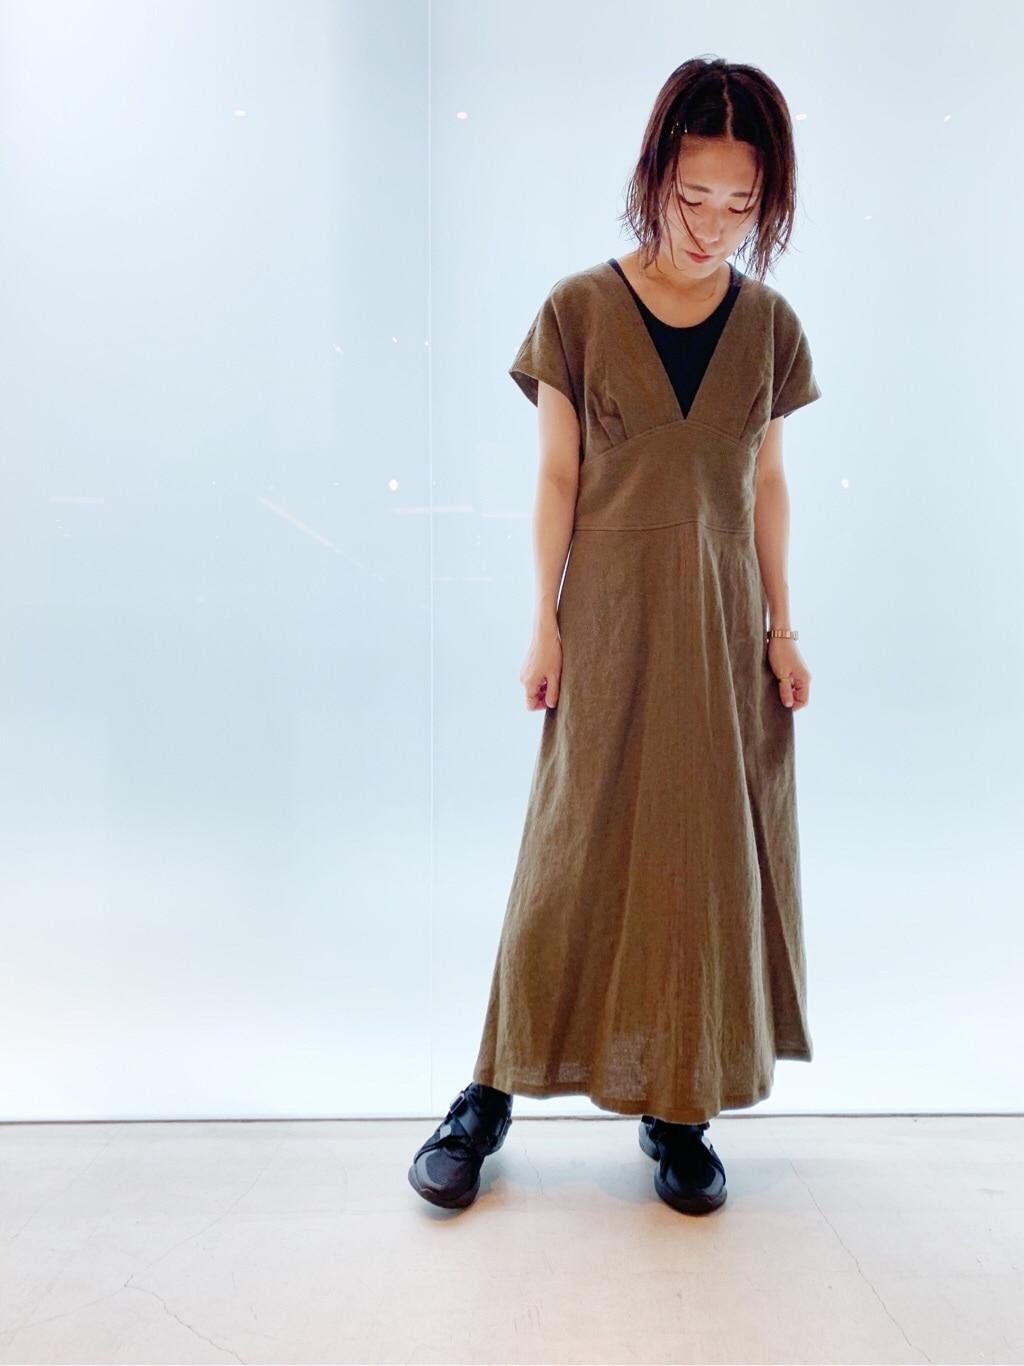 note et silence. 日本橋��島屋S.C. 身長:169cm 2019.08.08